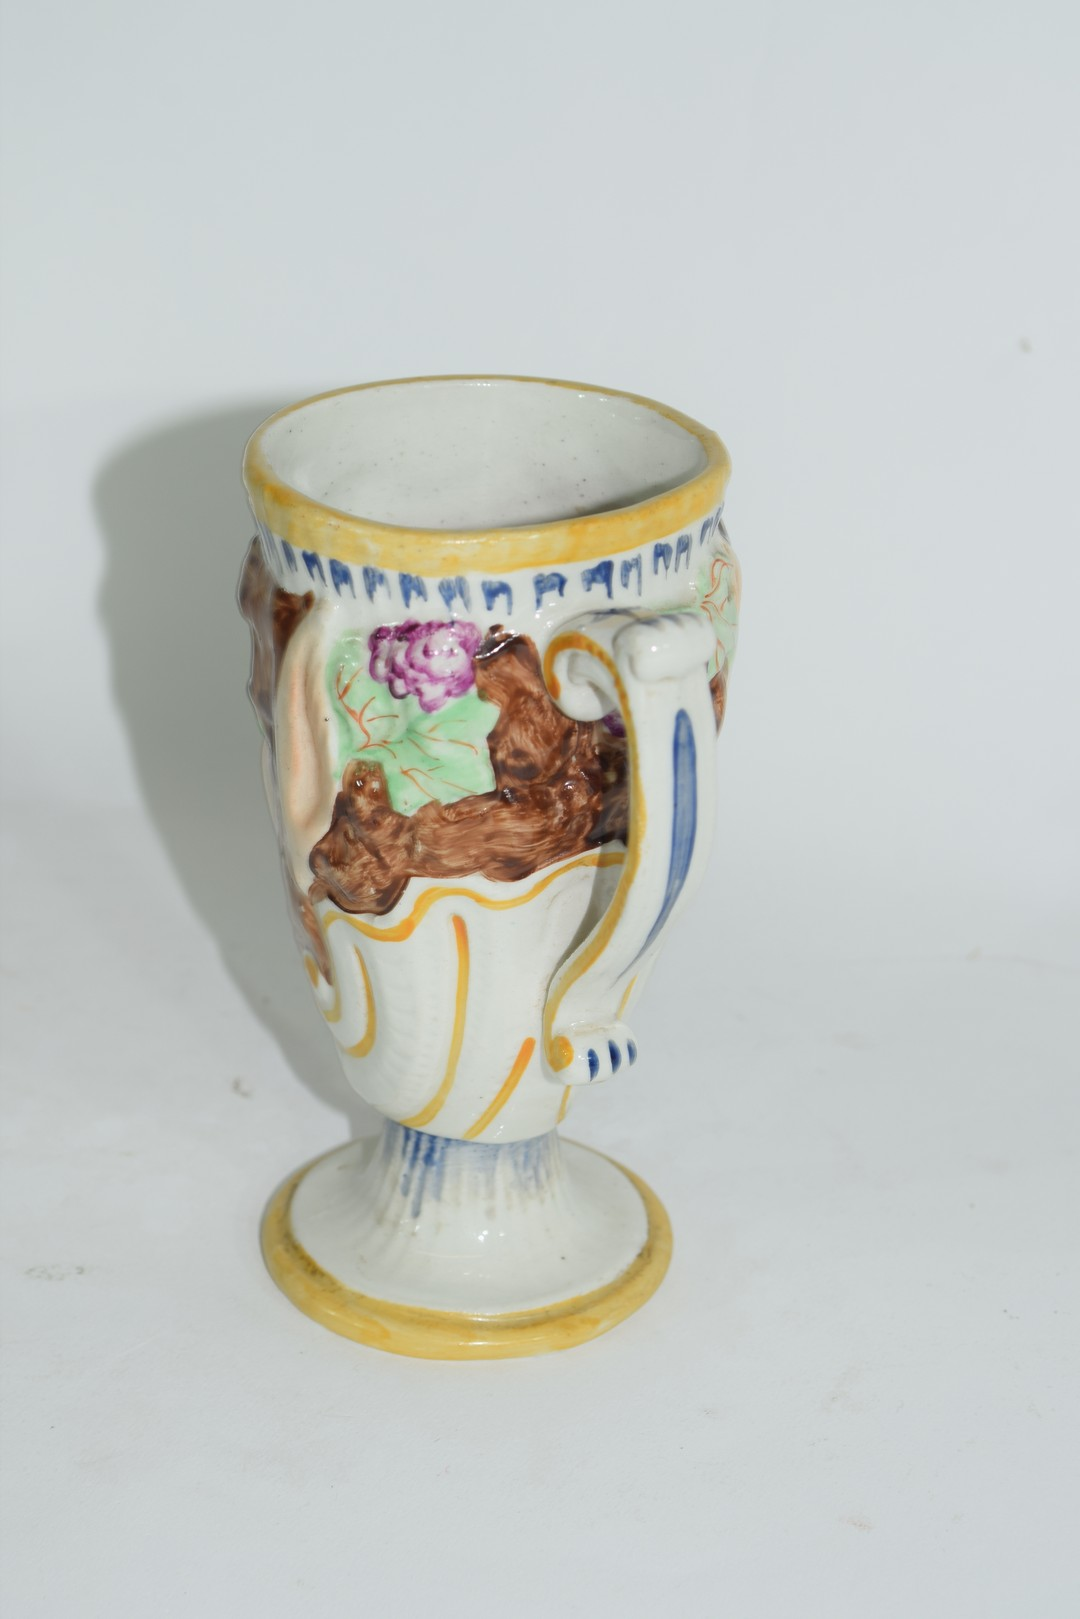 Late 19th century pearlware frog mug - Image 2 of 5